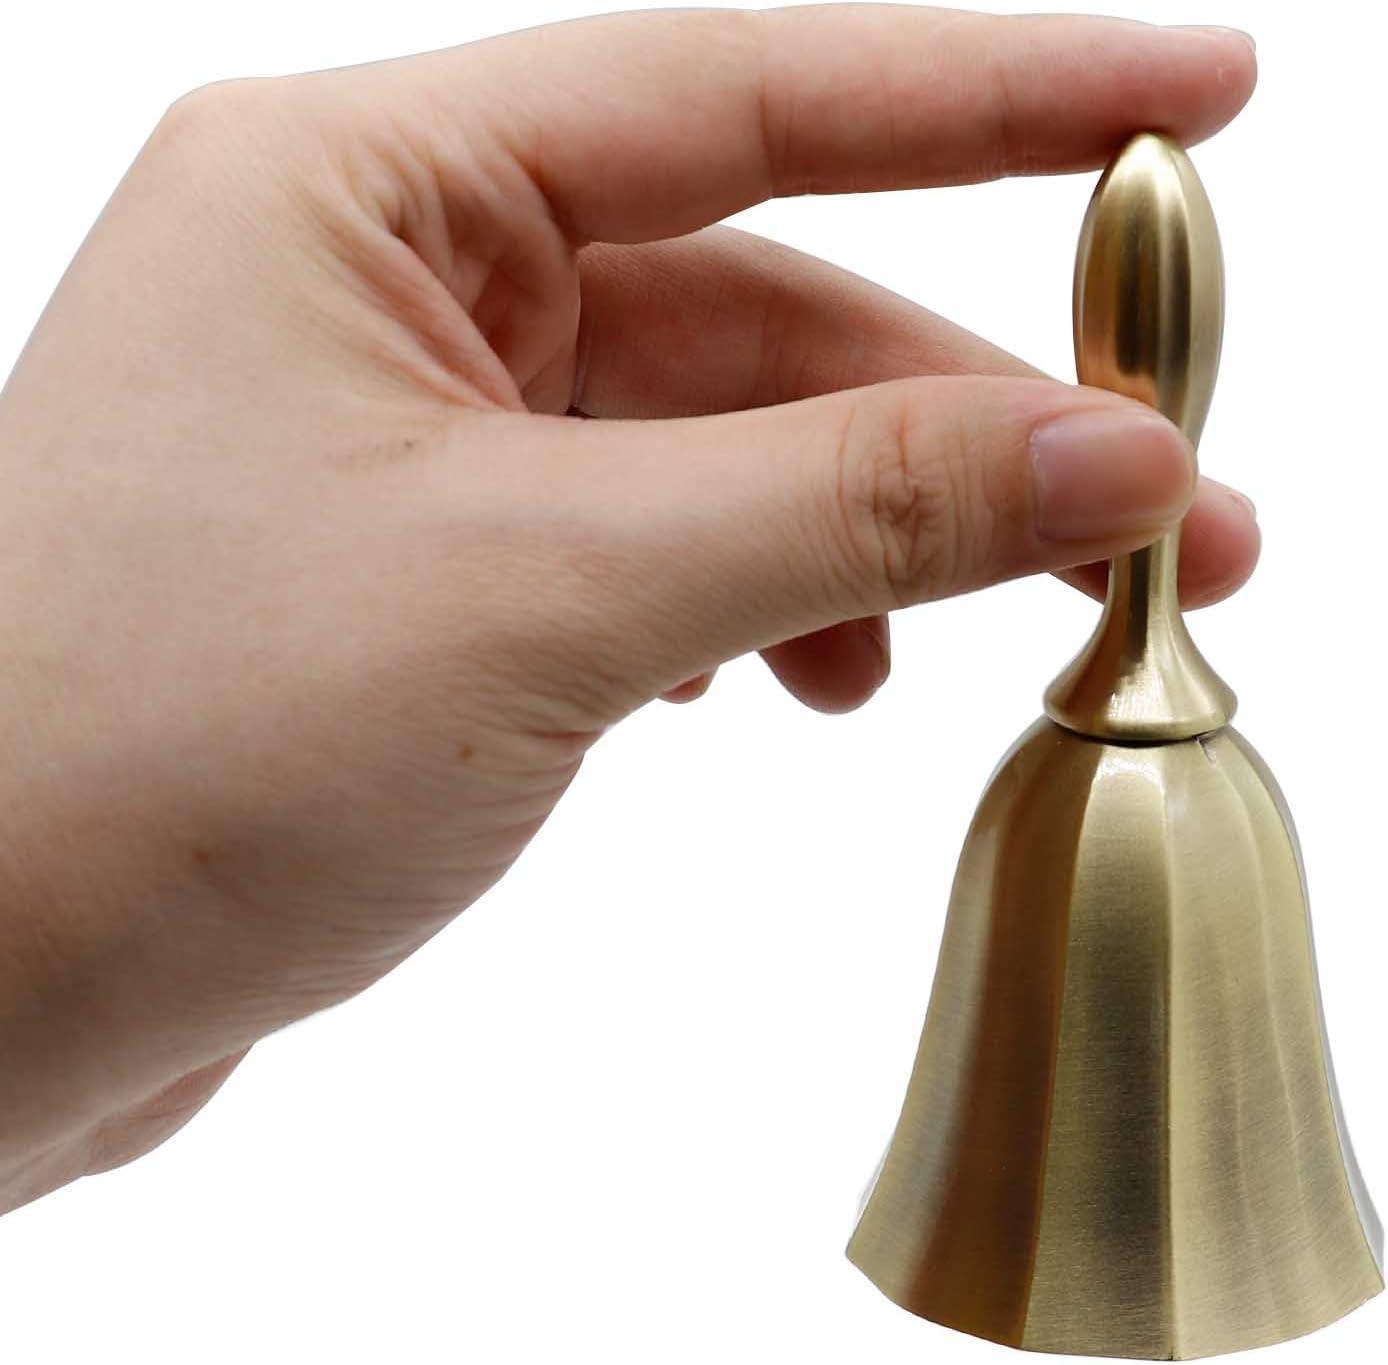 Christams Bell AVESON Hand Bell Tin Color Metal Loud Call Bell Alarm Hand Held Service Call Bell Desktop Bell Tea Dinner Bell Game Bell